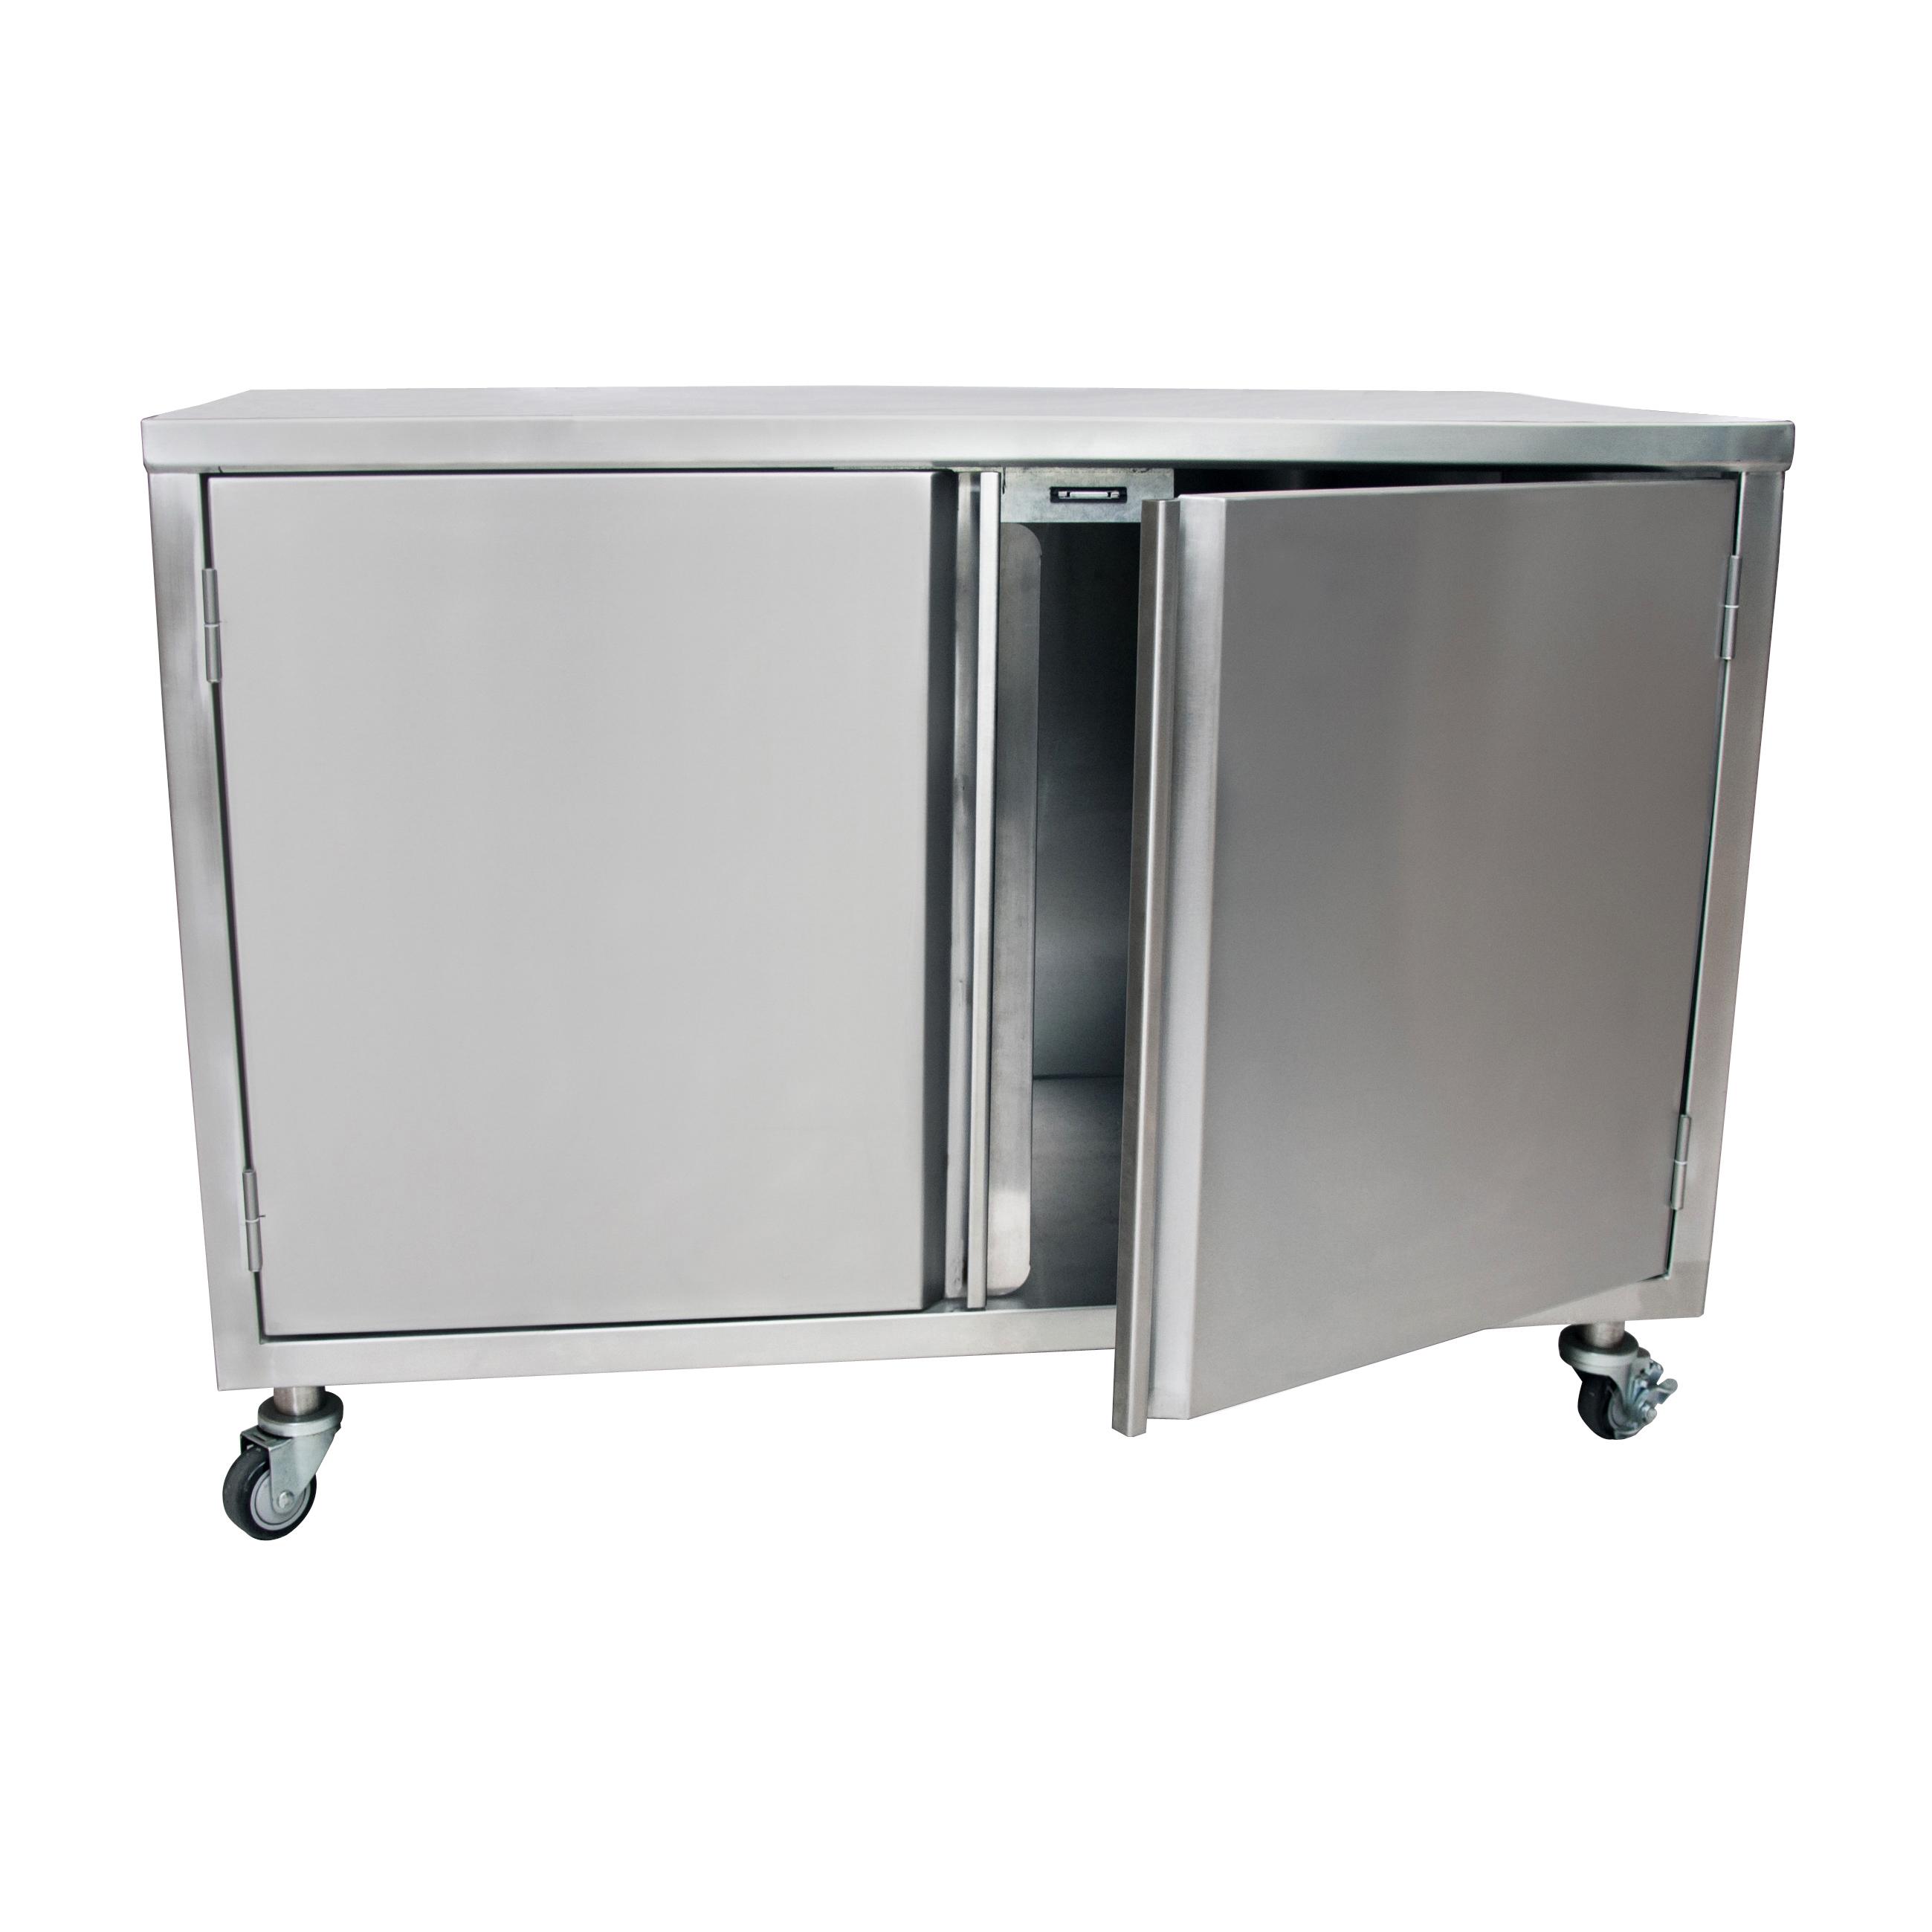 BK Resources BKDC-3660H work table, cabinet base hinged doors